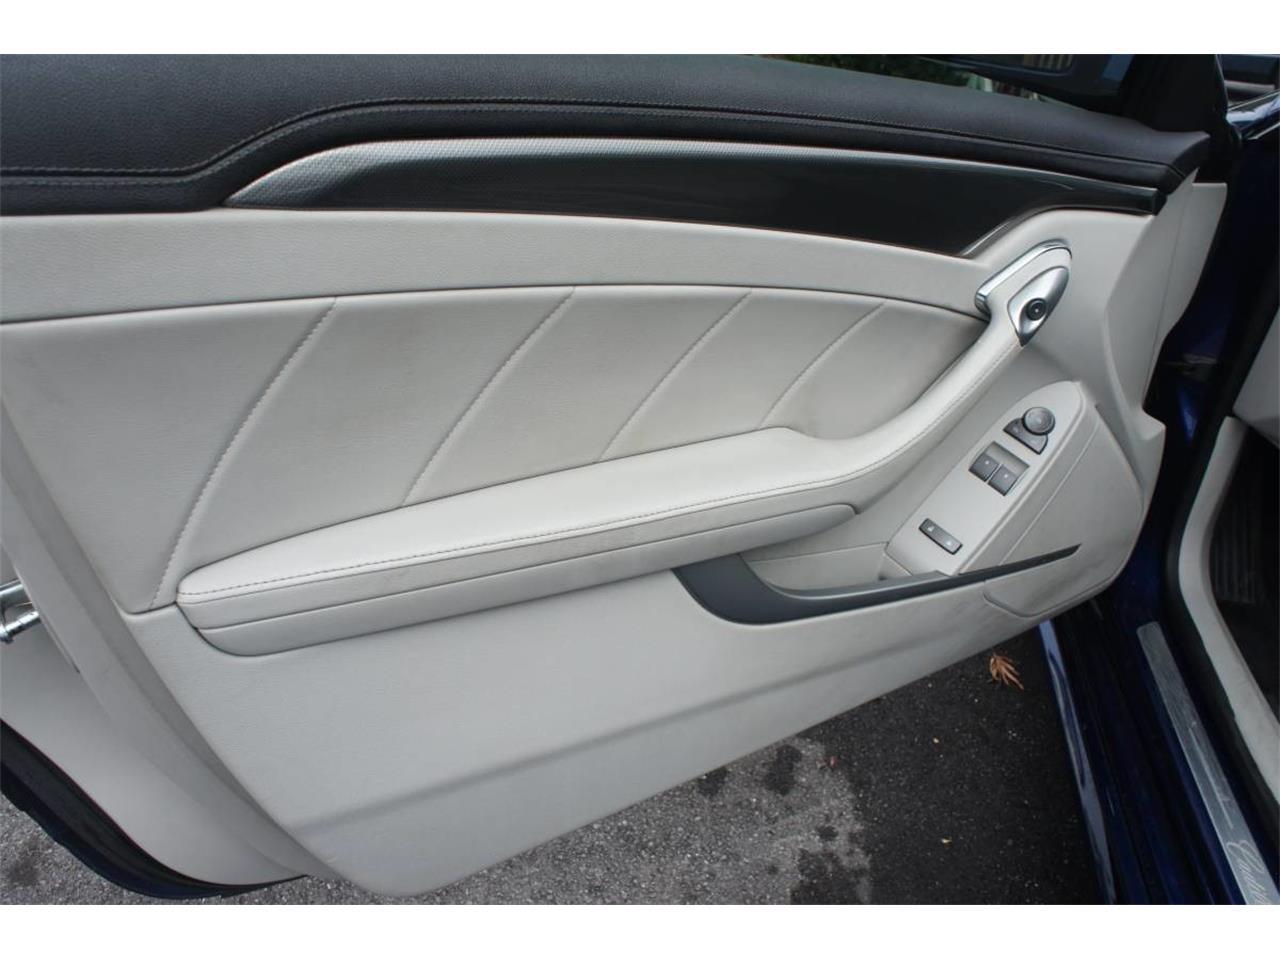 2012 Cadillac CTS (CC-1360289) for sale in Lantana, Florida